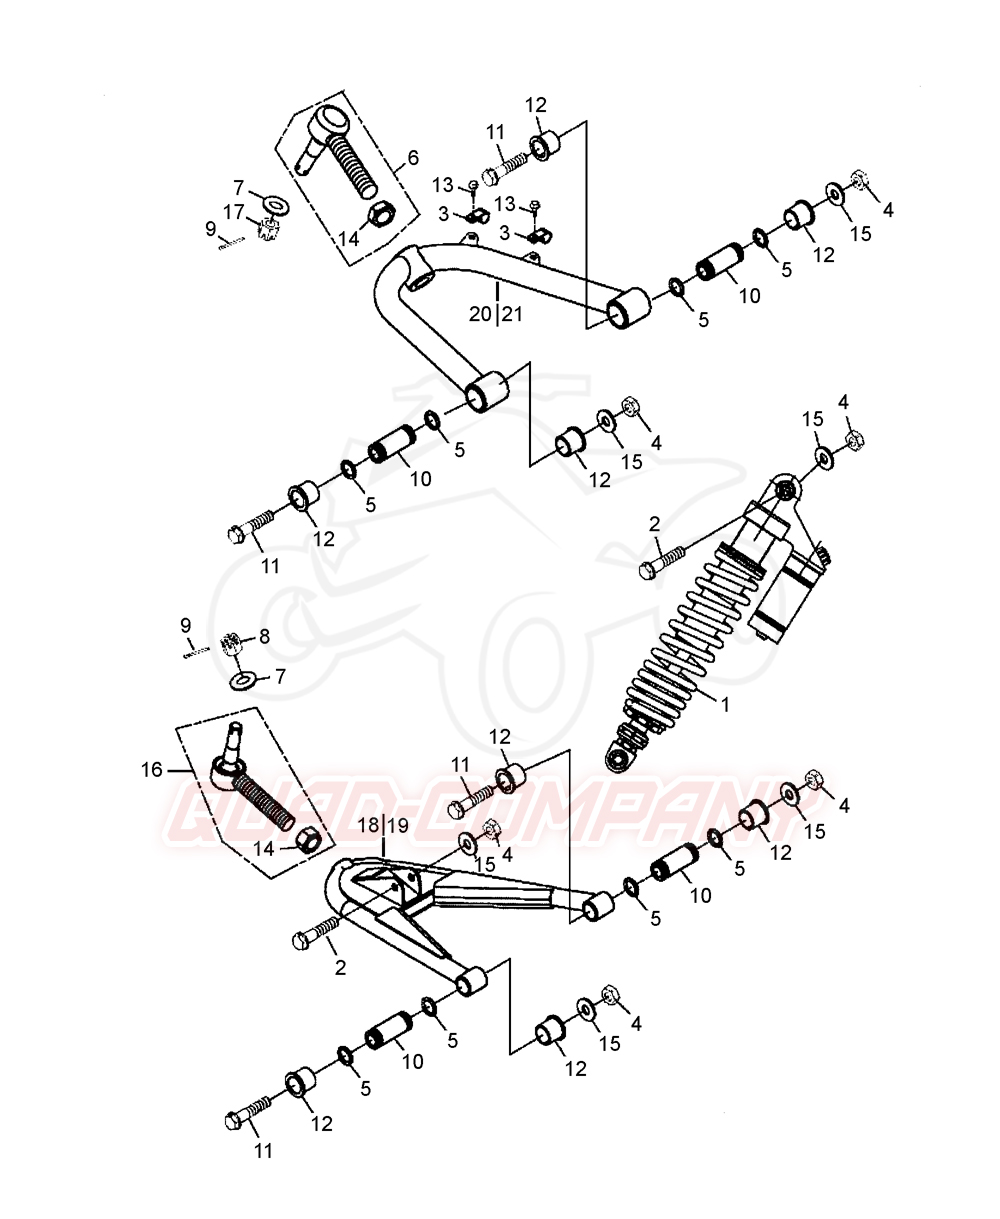 beeline bestia 5 5 offroad lof federbein vorne querlenker ersatzteile. Black Bedroom Furniture Sets. Home Design Ideas